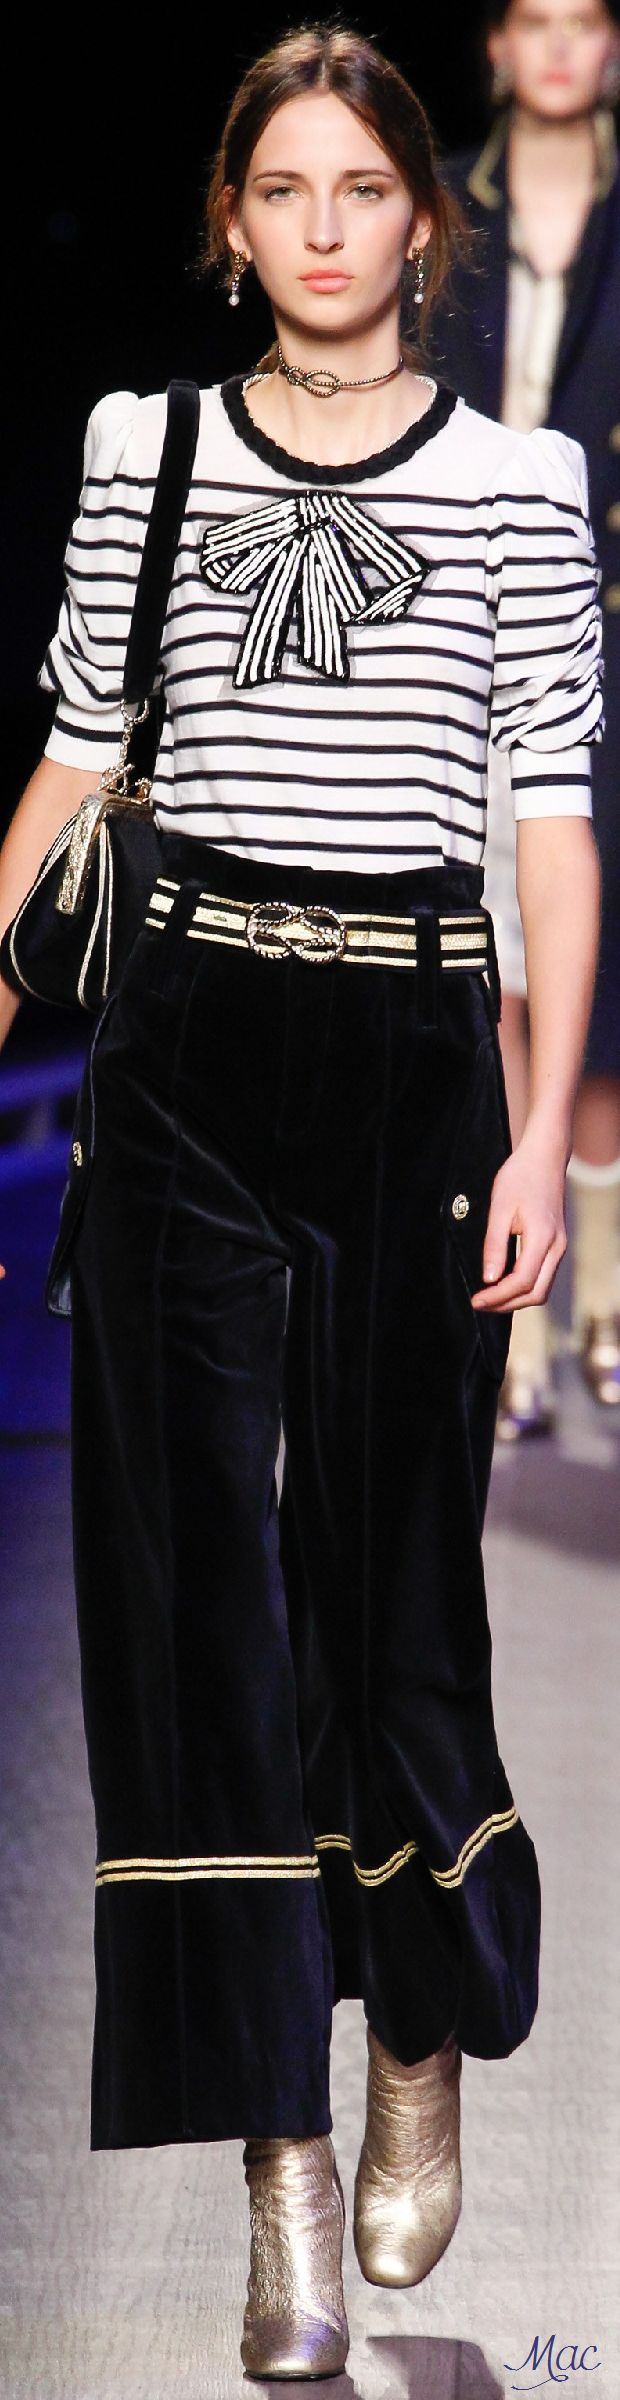 Fall 2016 Ready-to-Wear Tommy Hilfiger